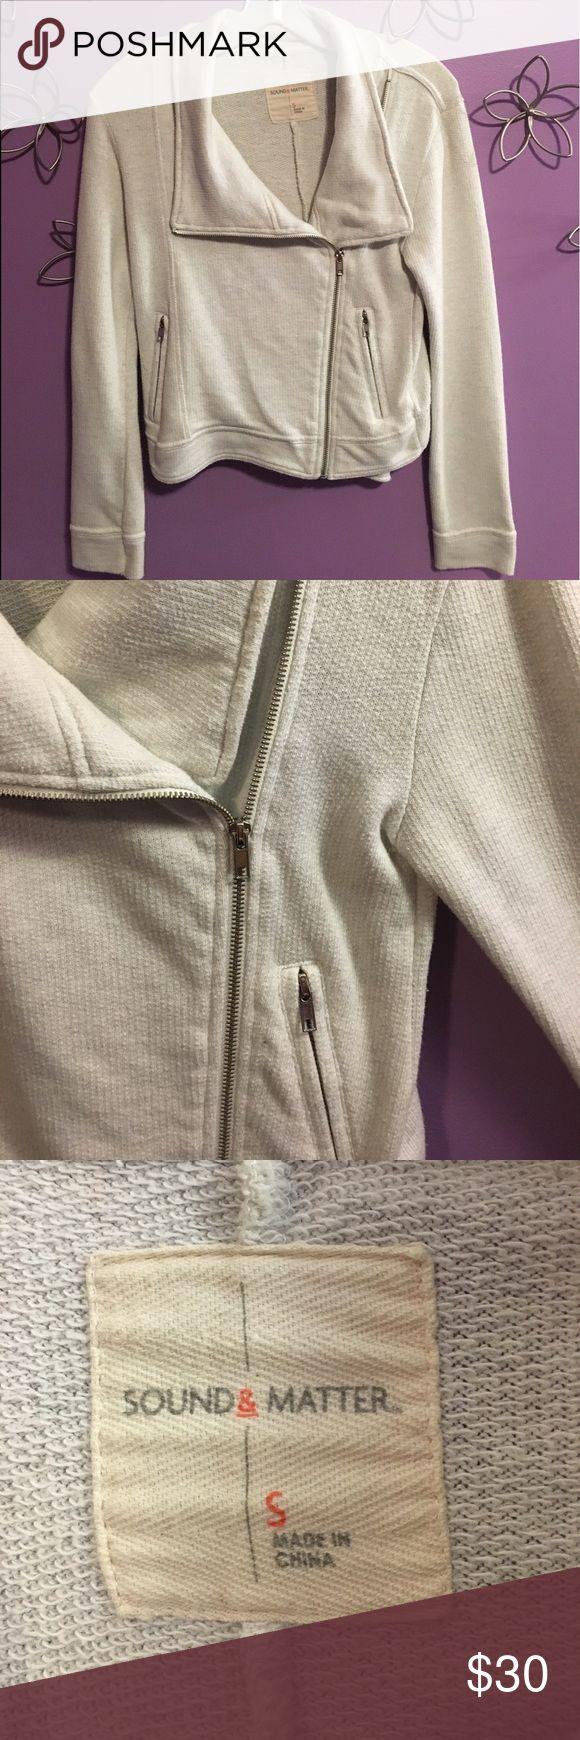 Women's Side Zip Up Sweater Beautiful white sweater with collar. Silver side zipper. Zip up pockets! Runs small! Sound & Matter Tops Sweatshirts & Hoodies